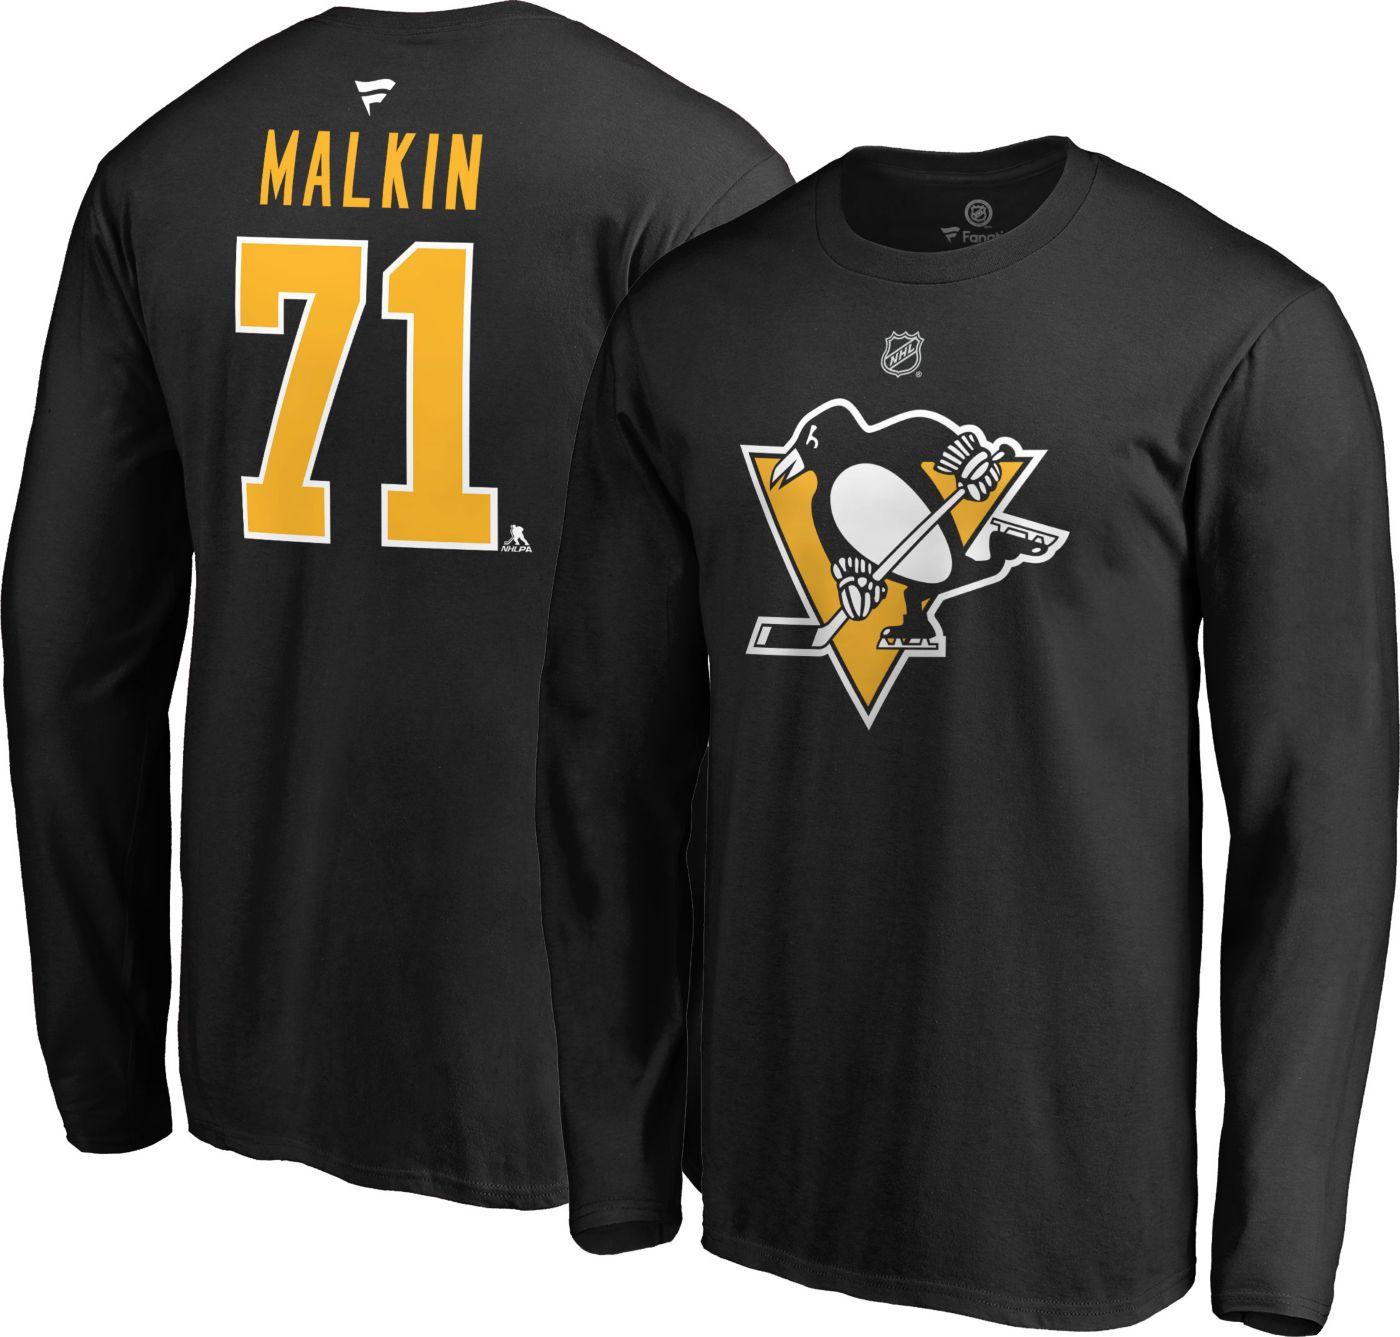 NHL Men's Pittsburgh Penguins Evgeni Malkin #71 Black Long Sleeve Player Shirt